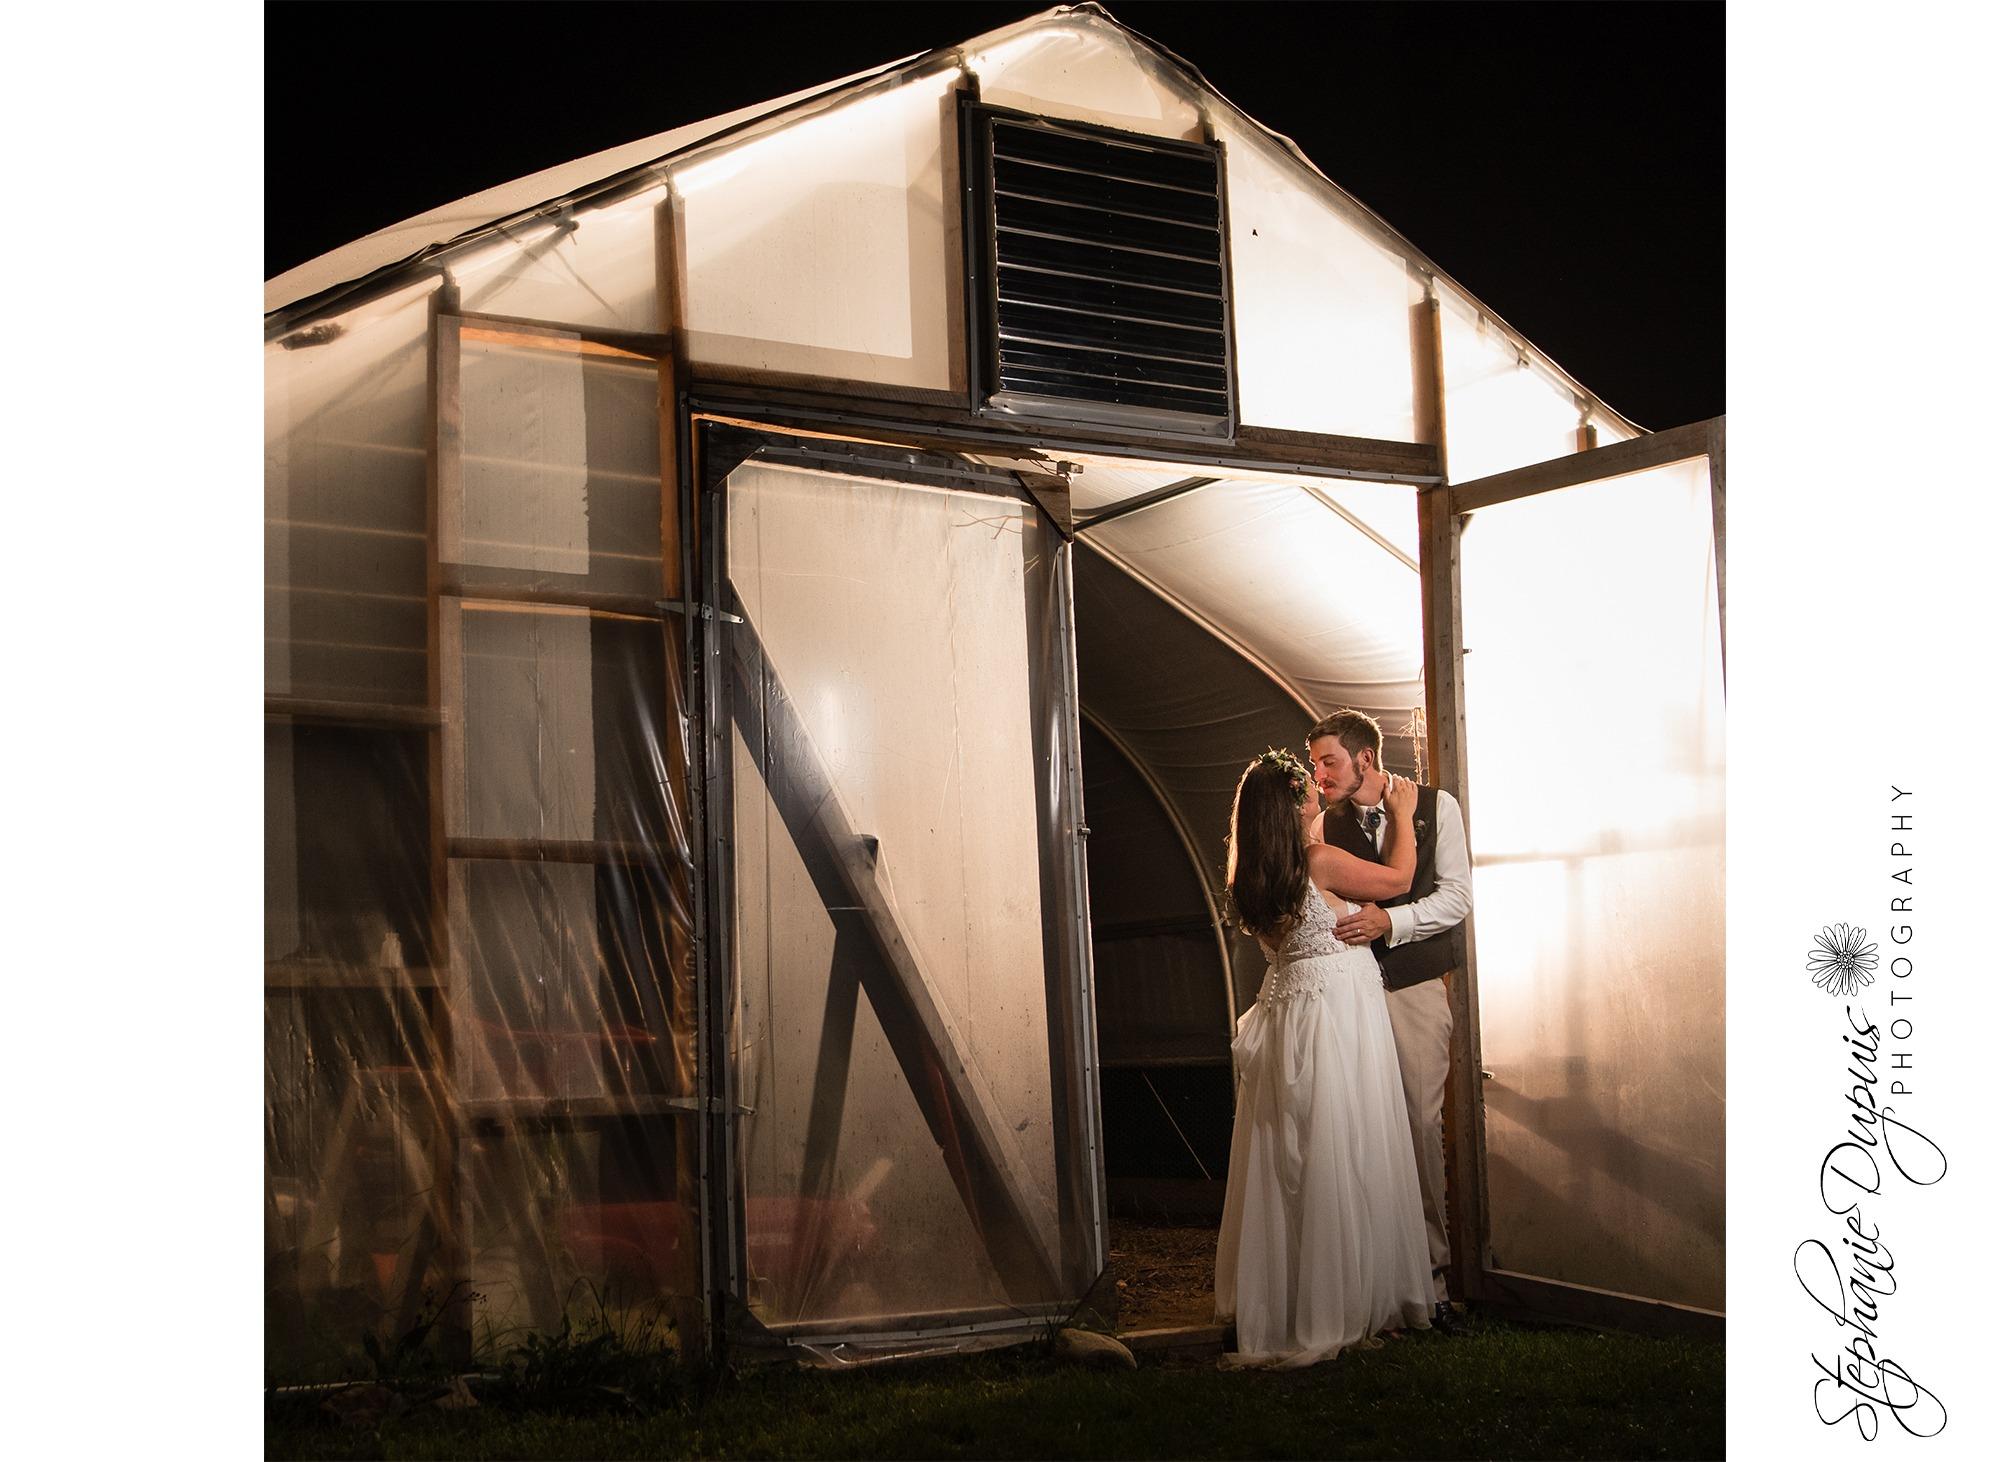 Hicks Wedding 19 - Portfolio: Hick's Wedding